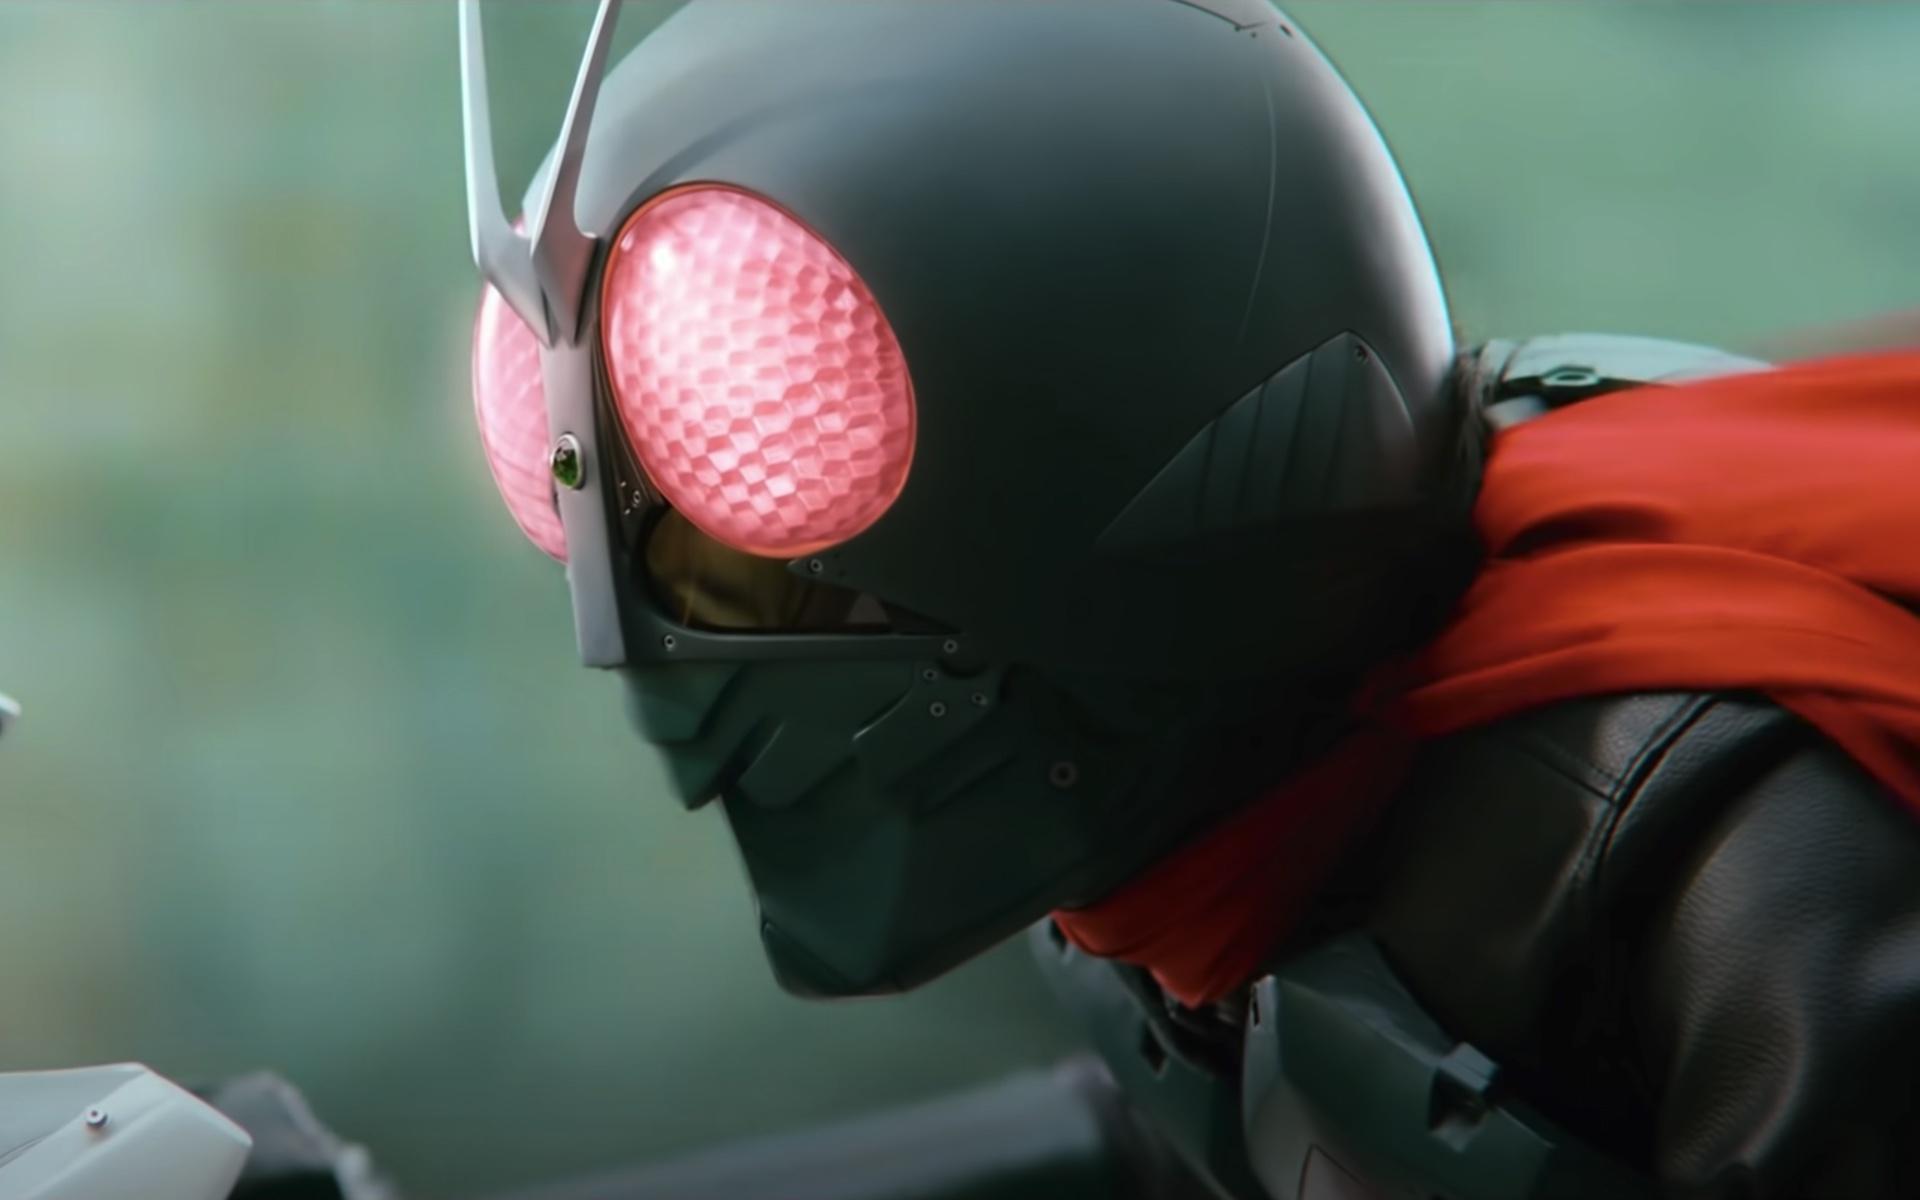 A closeup shot of Kamen Rider from Hideaki Anno's Shin Kamen Rider